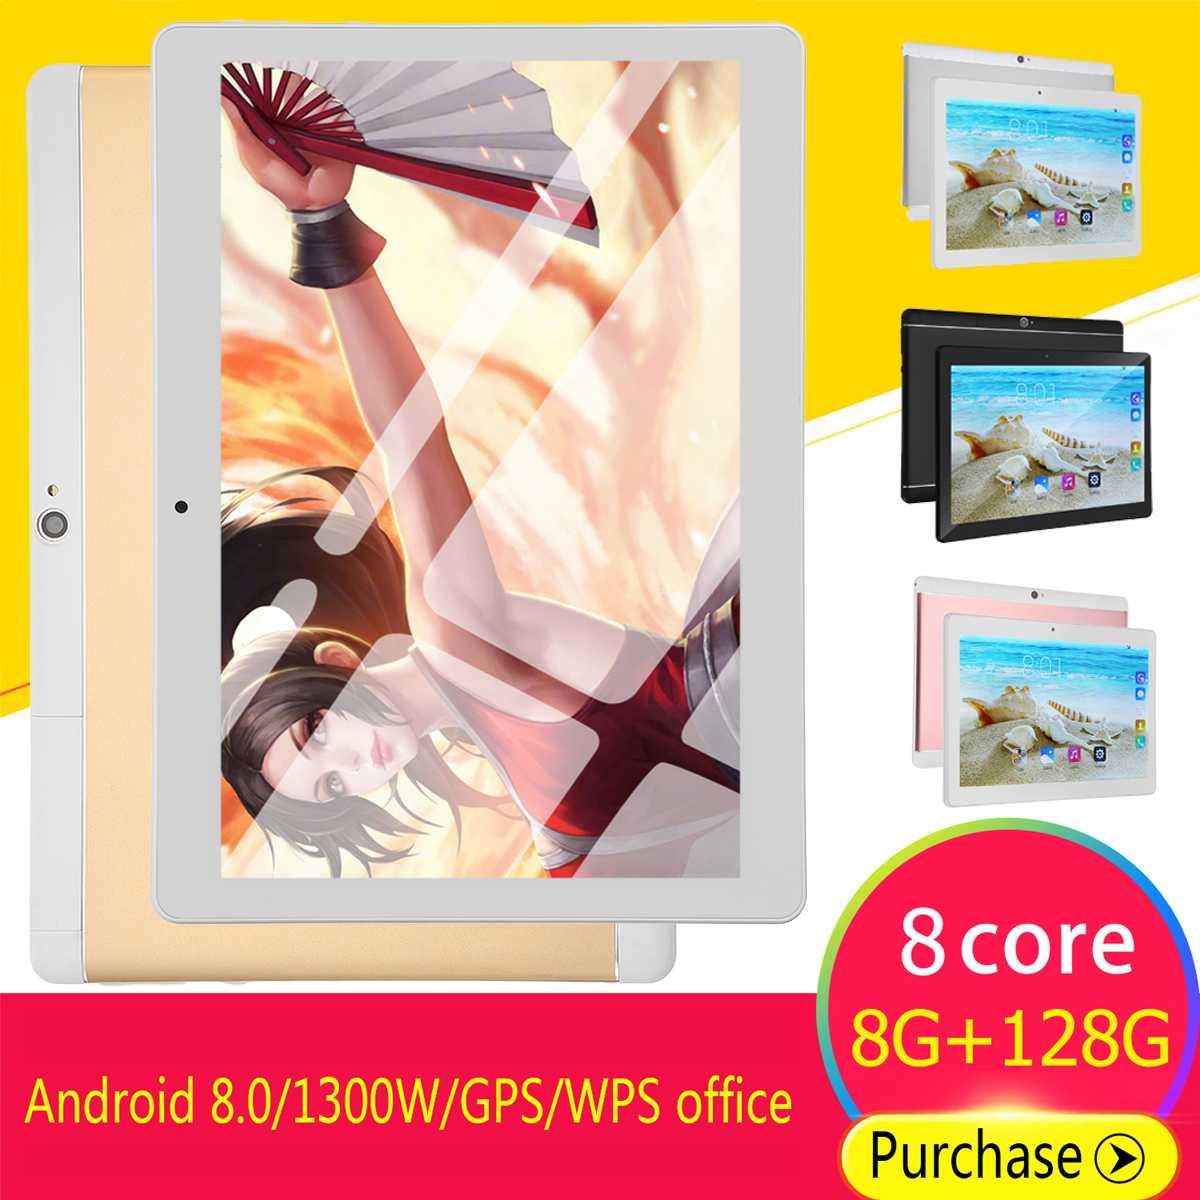 10 Inch HD Tablet PC 8+128GB 9000mAh Single Cameras/SIMs Octa Cores 3G Call Tab Android 8.0 Tab GPS WIFi Bluetooth 4.0 Pad